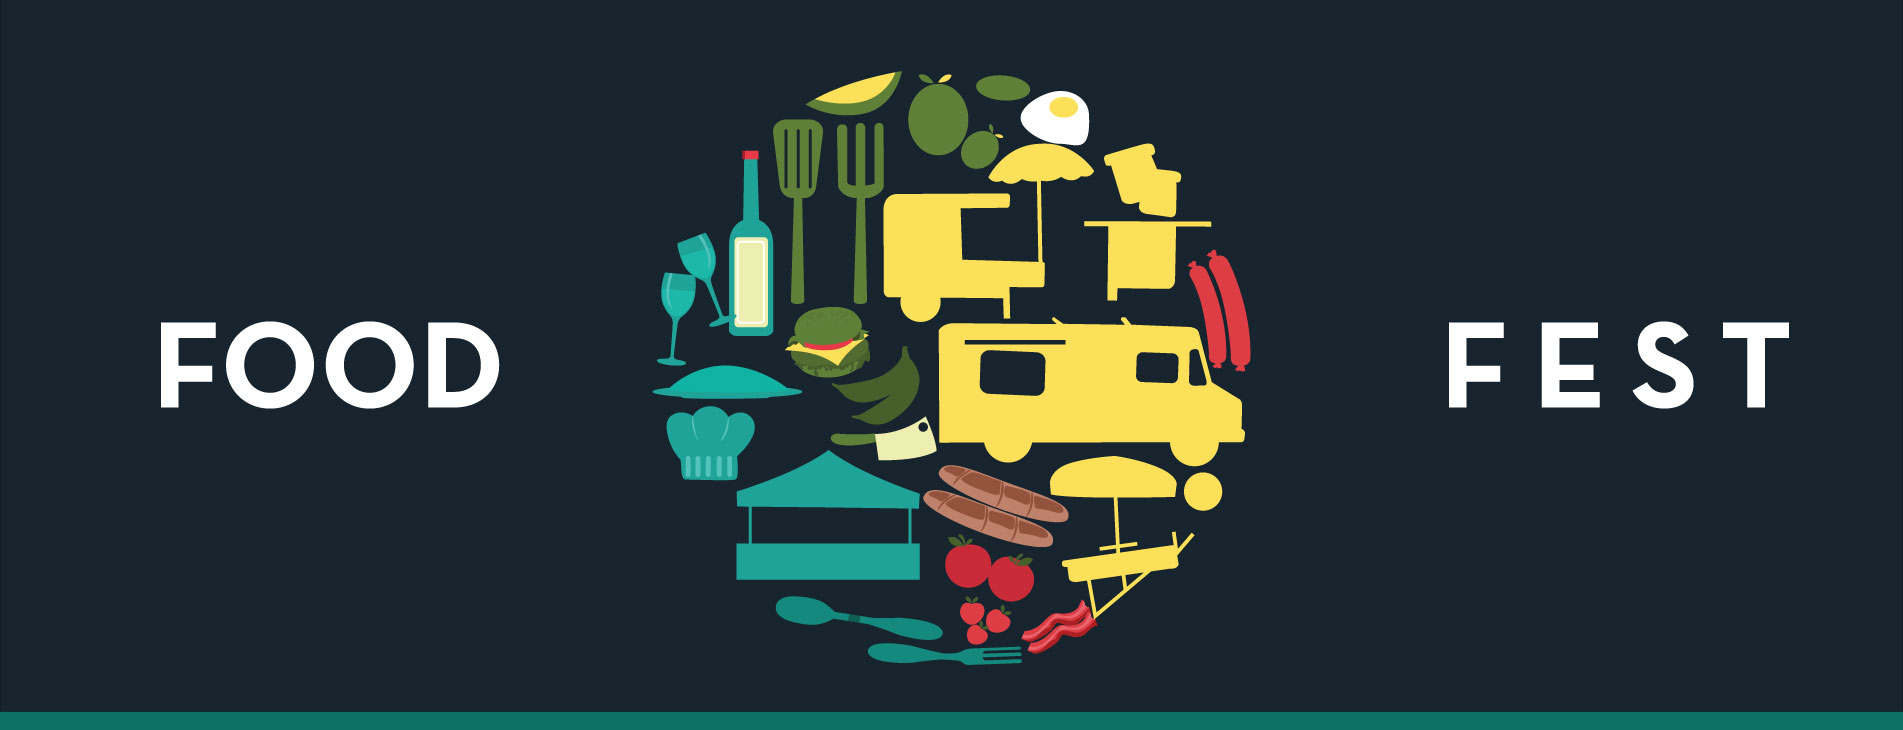 Food Fest icons